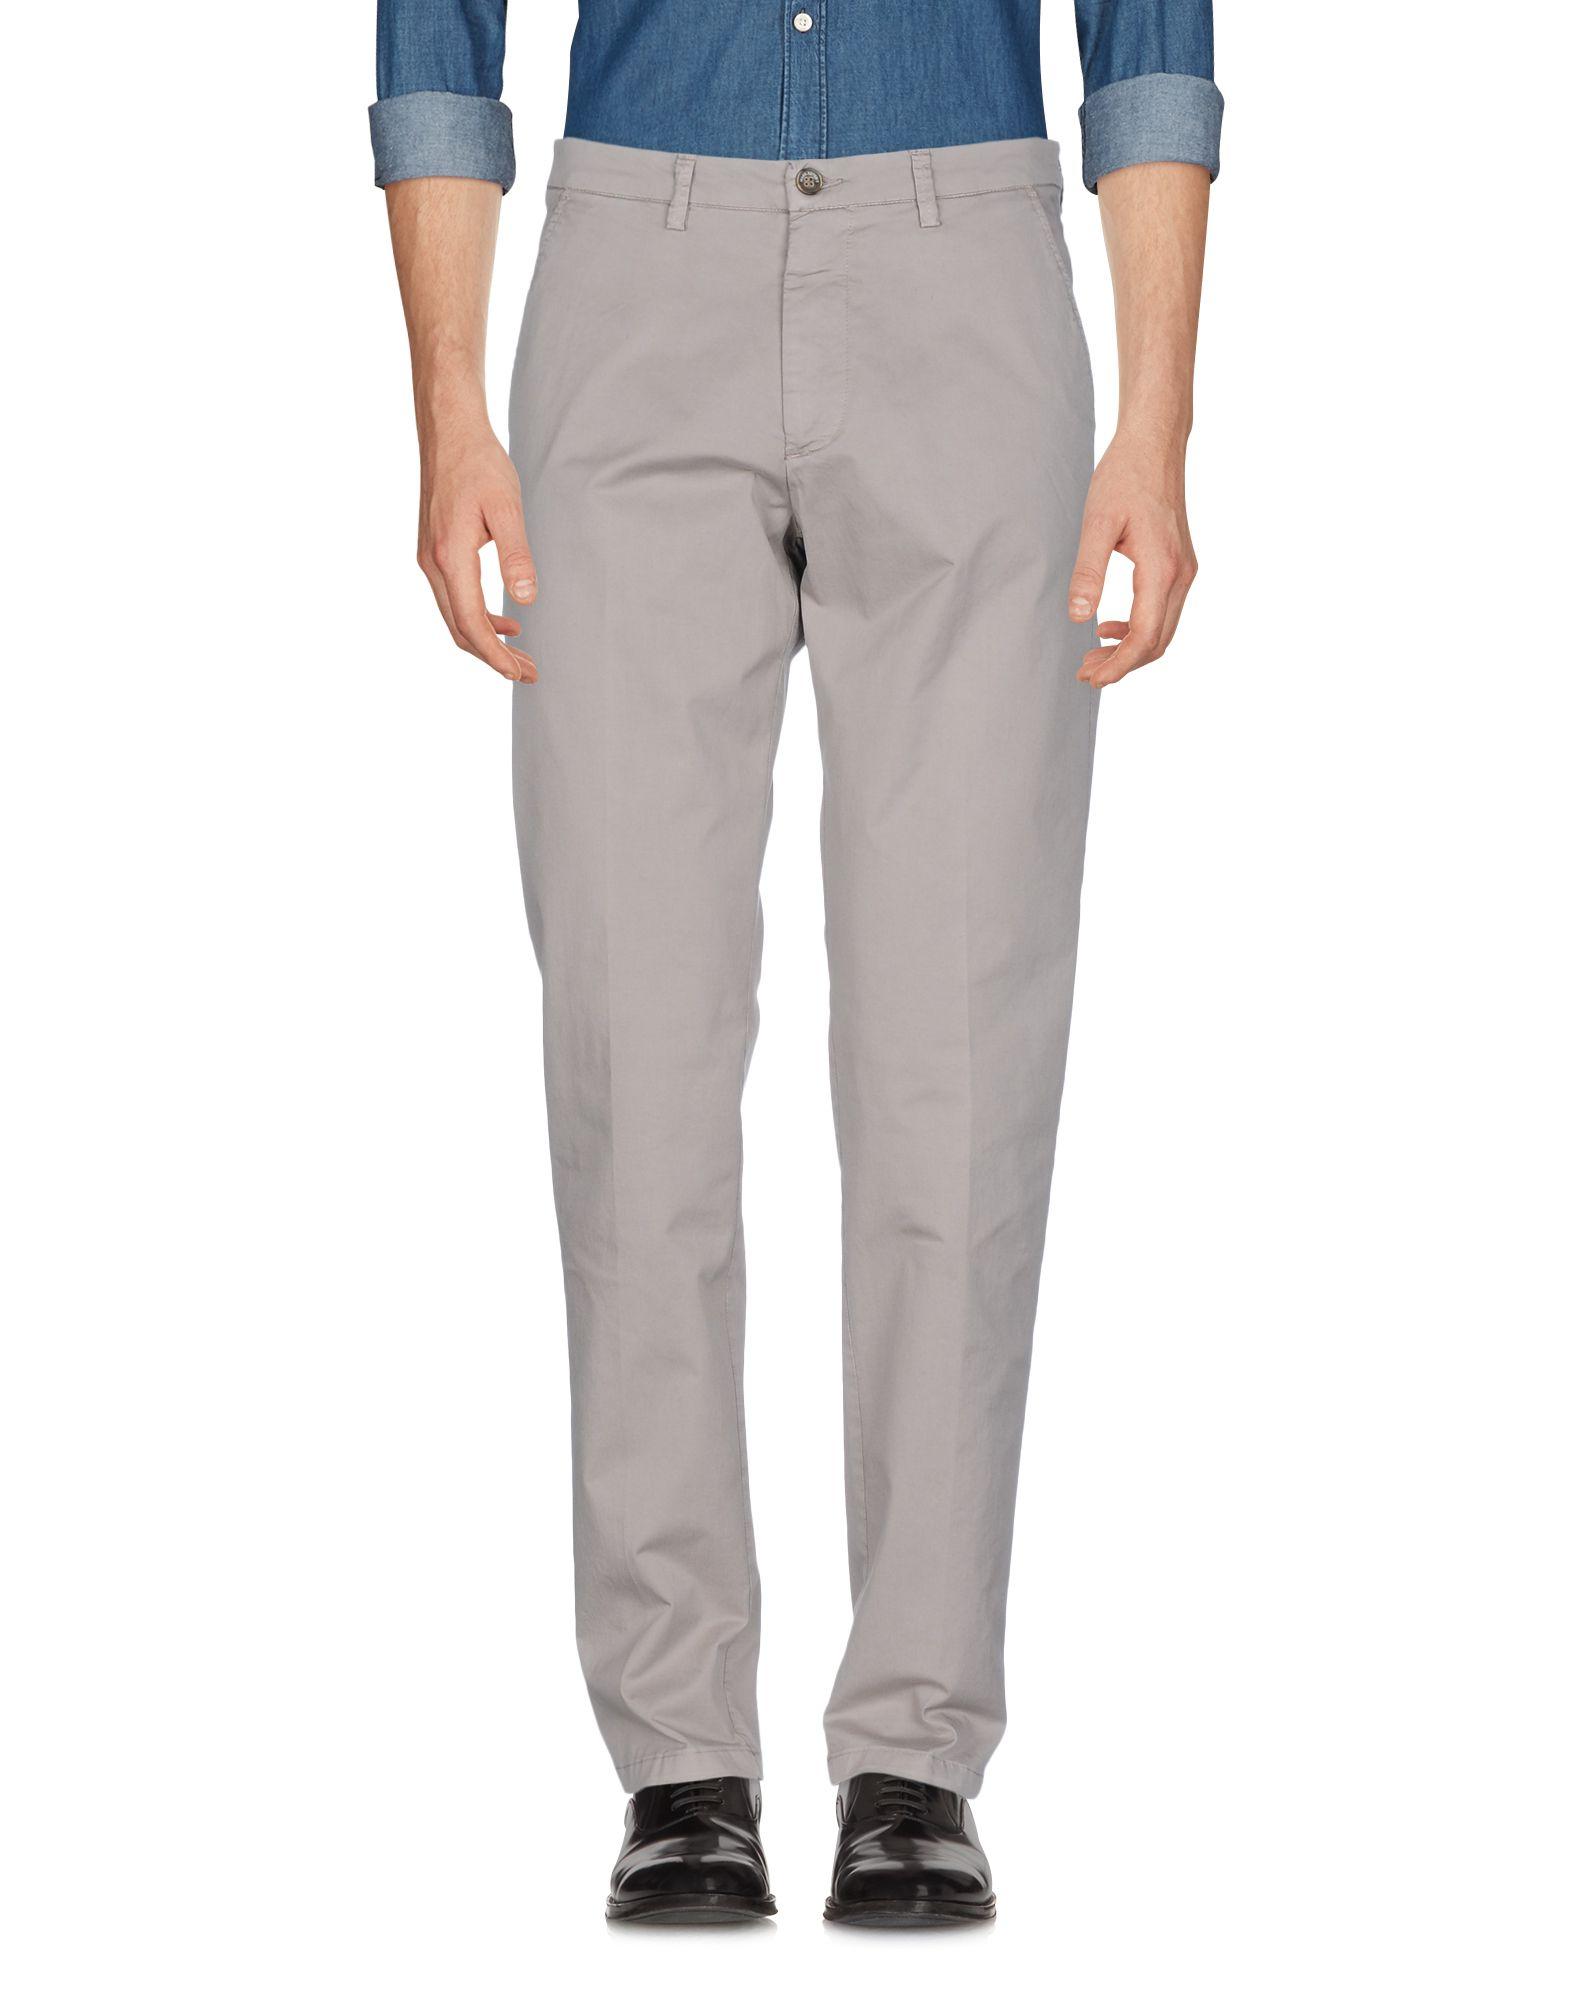 REVER'S Повседневные брюки брюки piamente